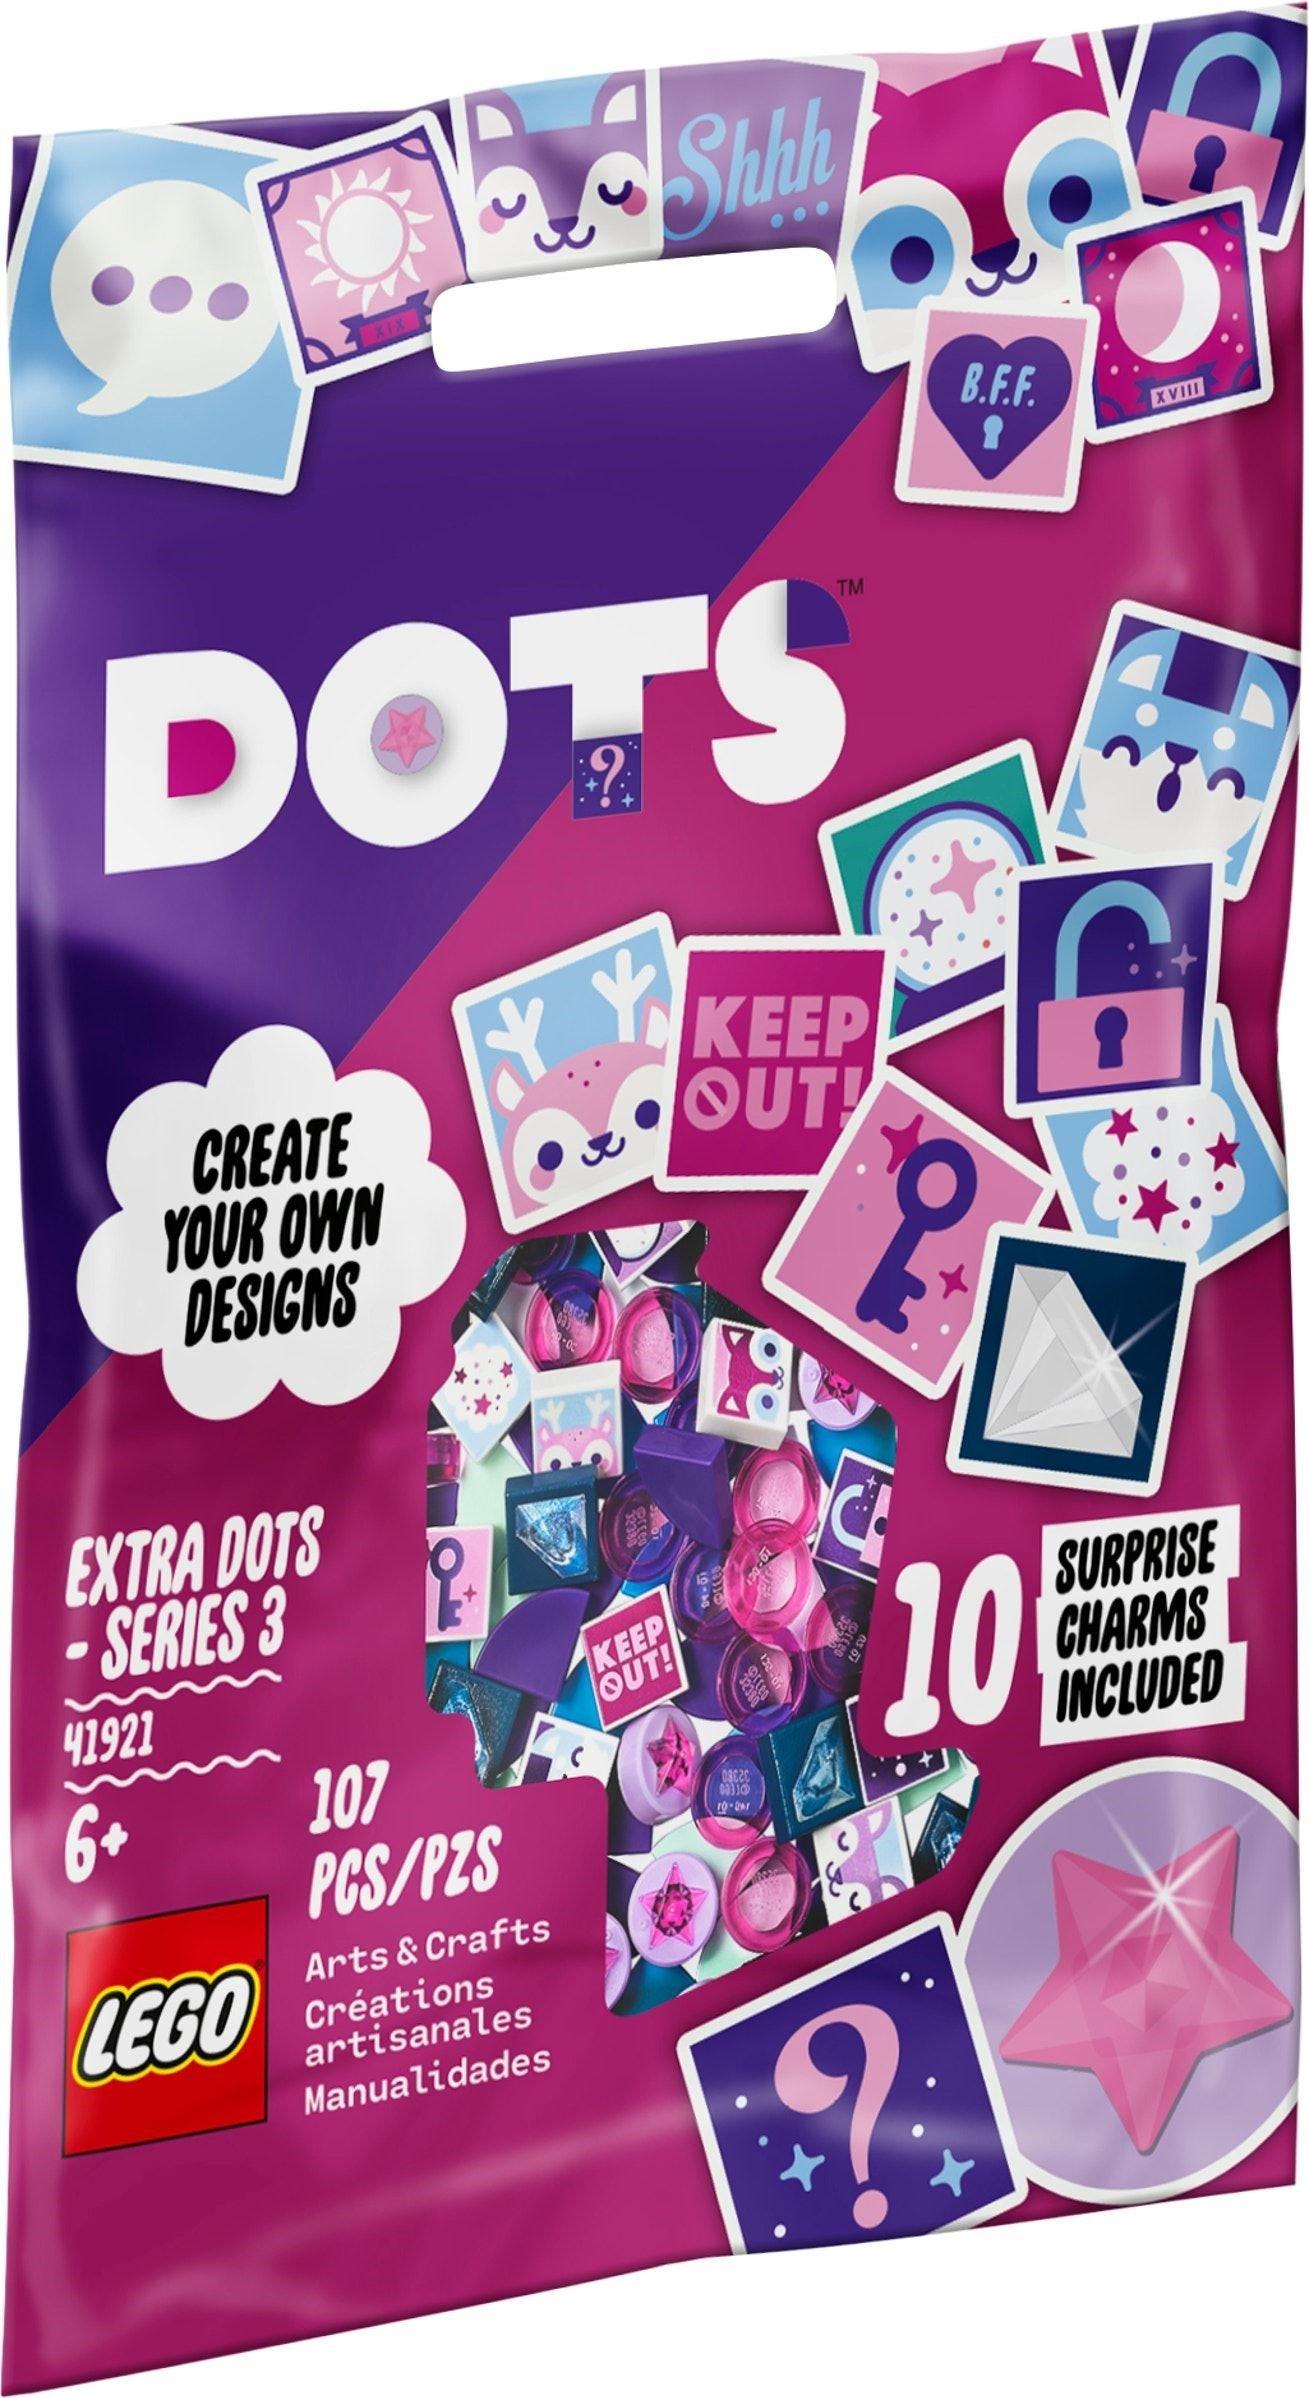 LEGO DOTS - Extra DOTS - Series 3 (41921)